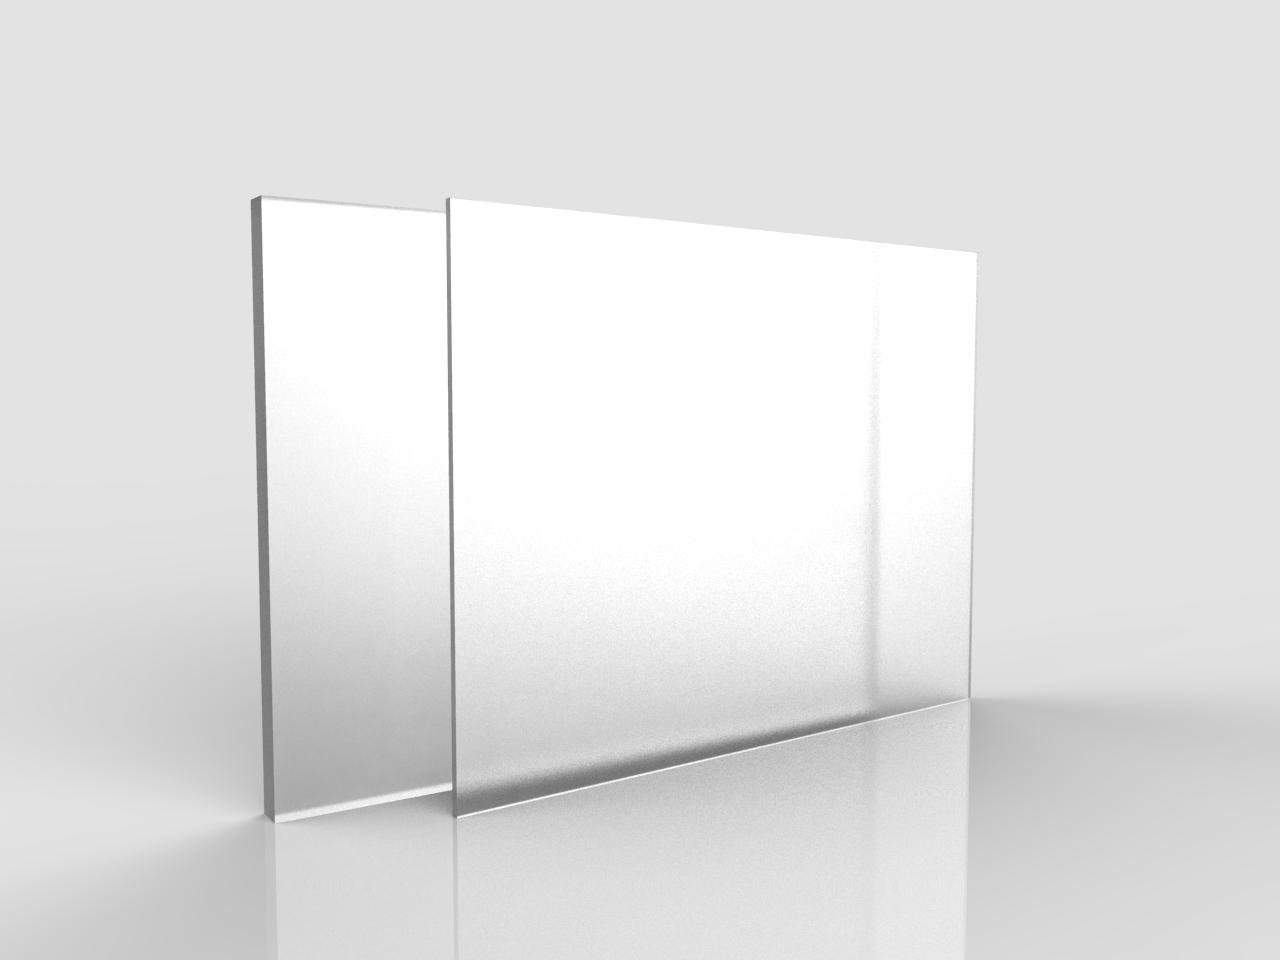 Lastre plexiglass monosatinato vendita materie plastiche for Pannelli plexiglass prezzi